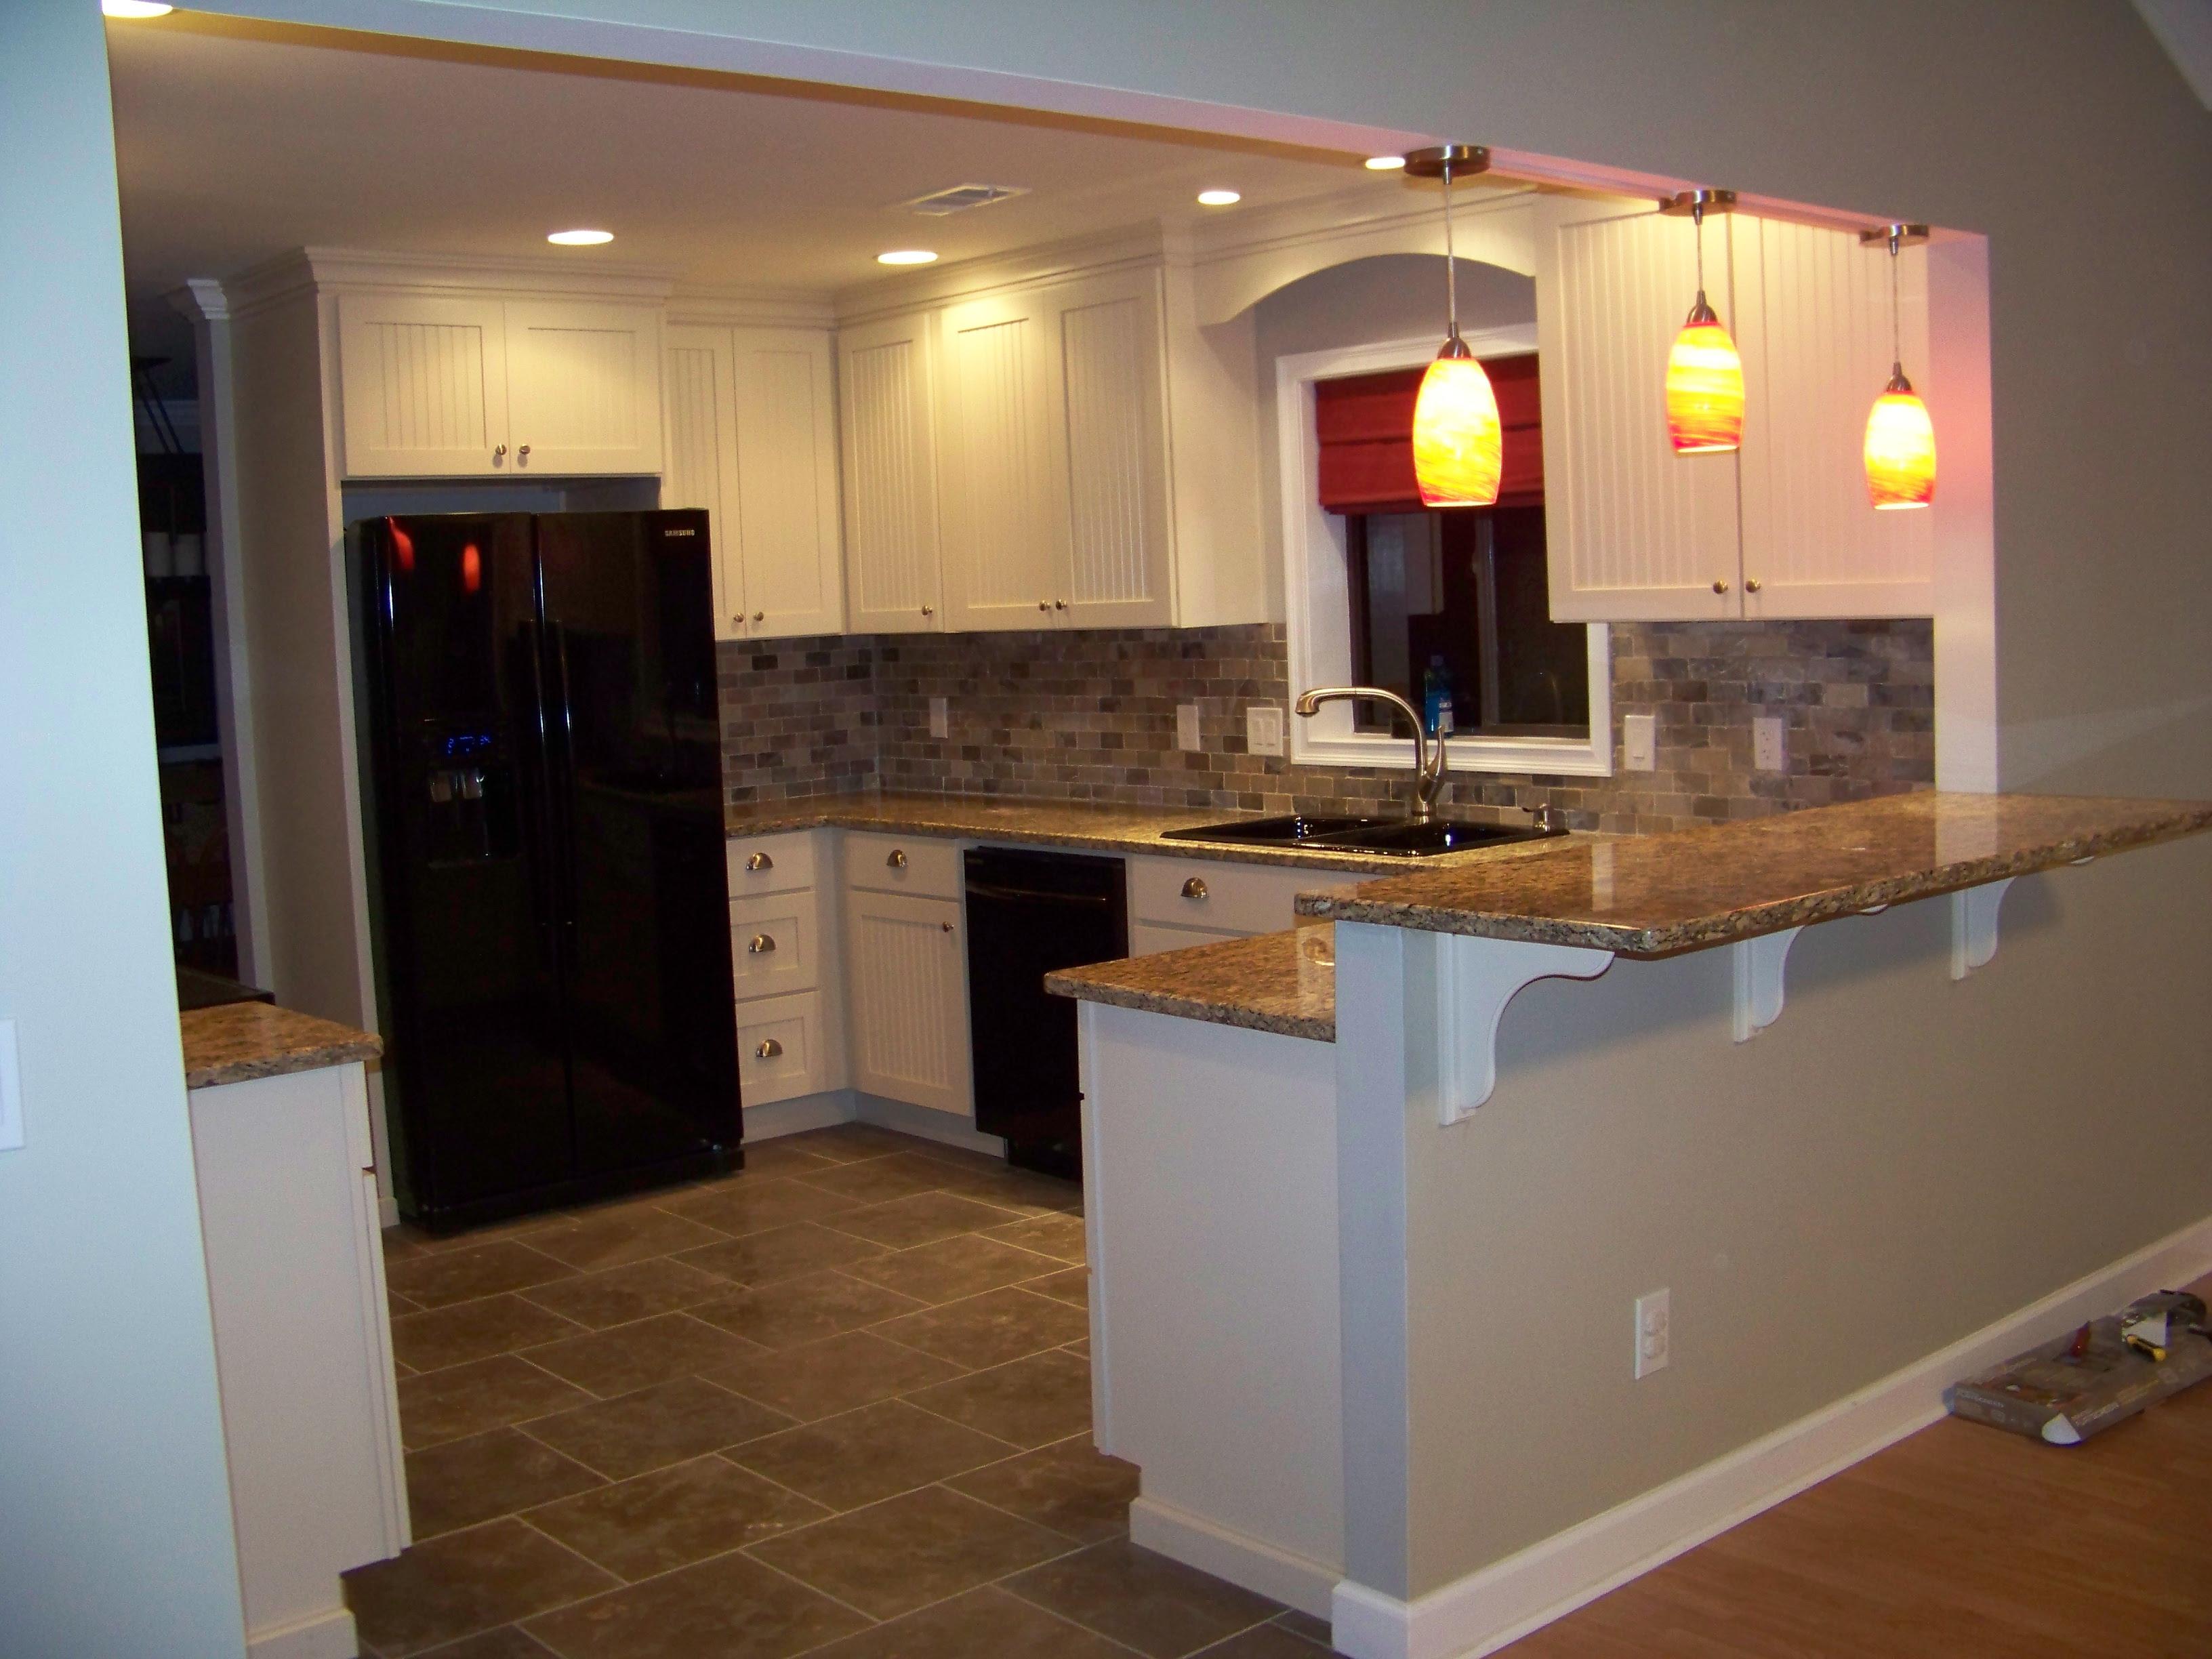 Renewable Renovations and Restorations | Marietta, GA 30062